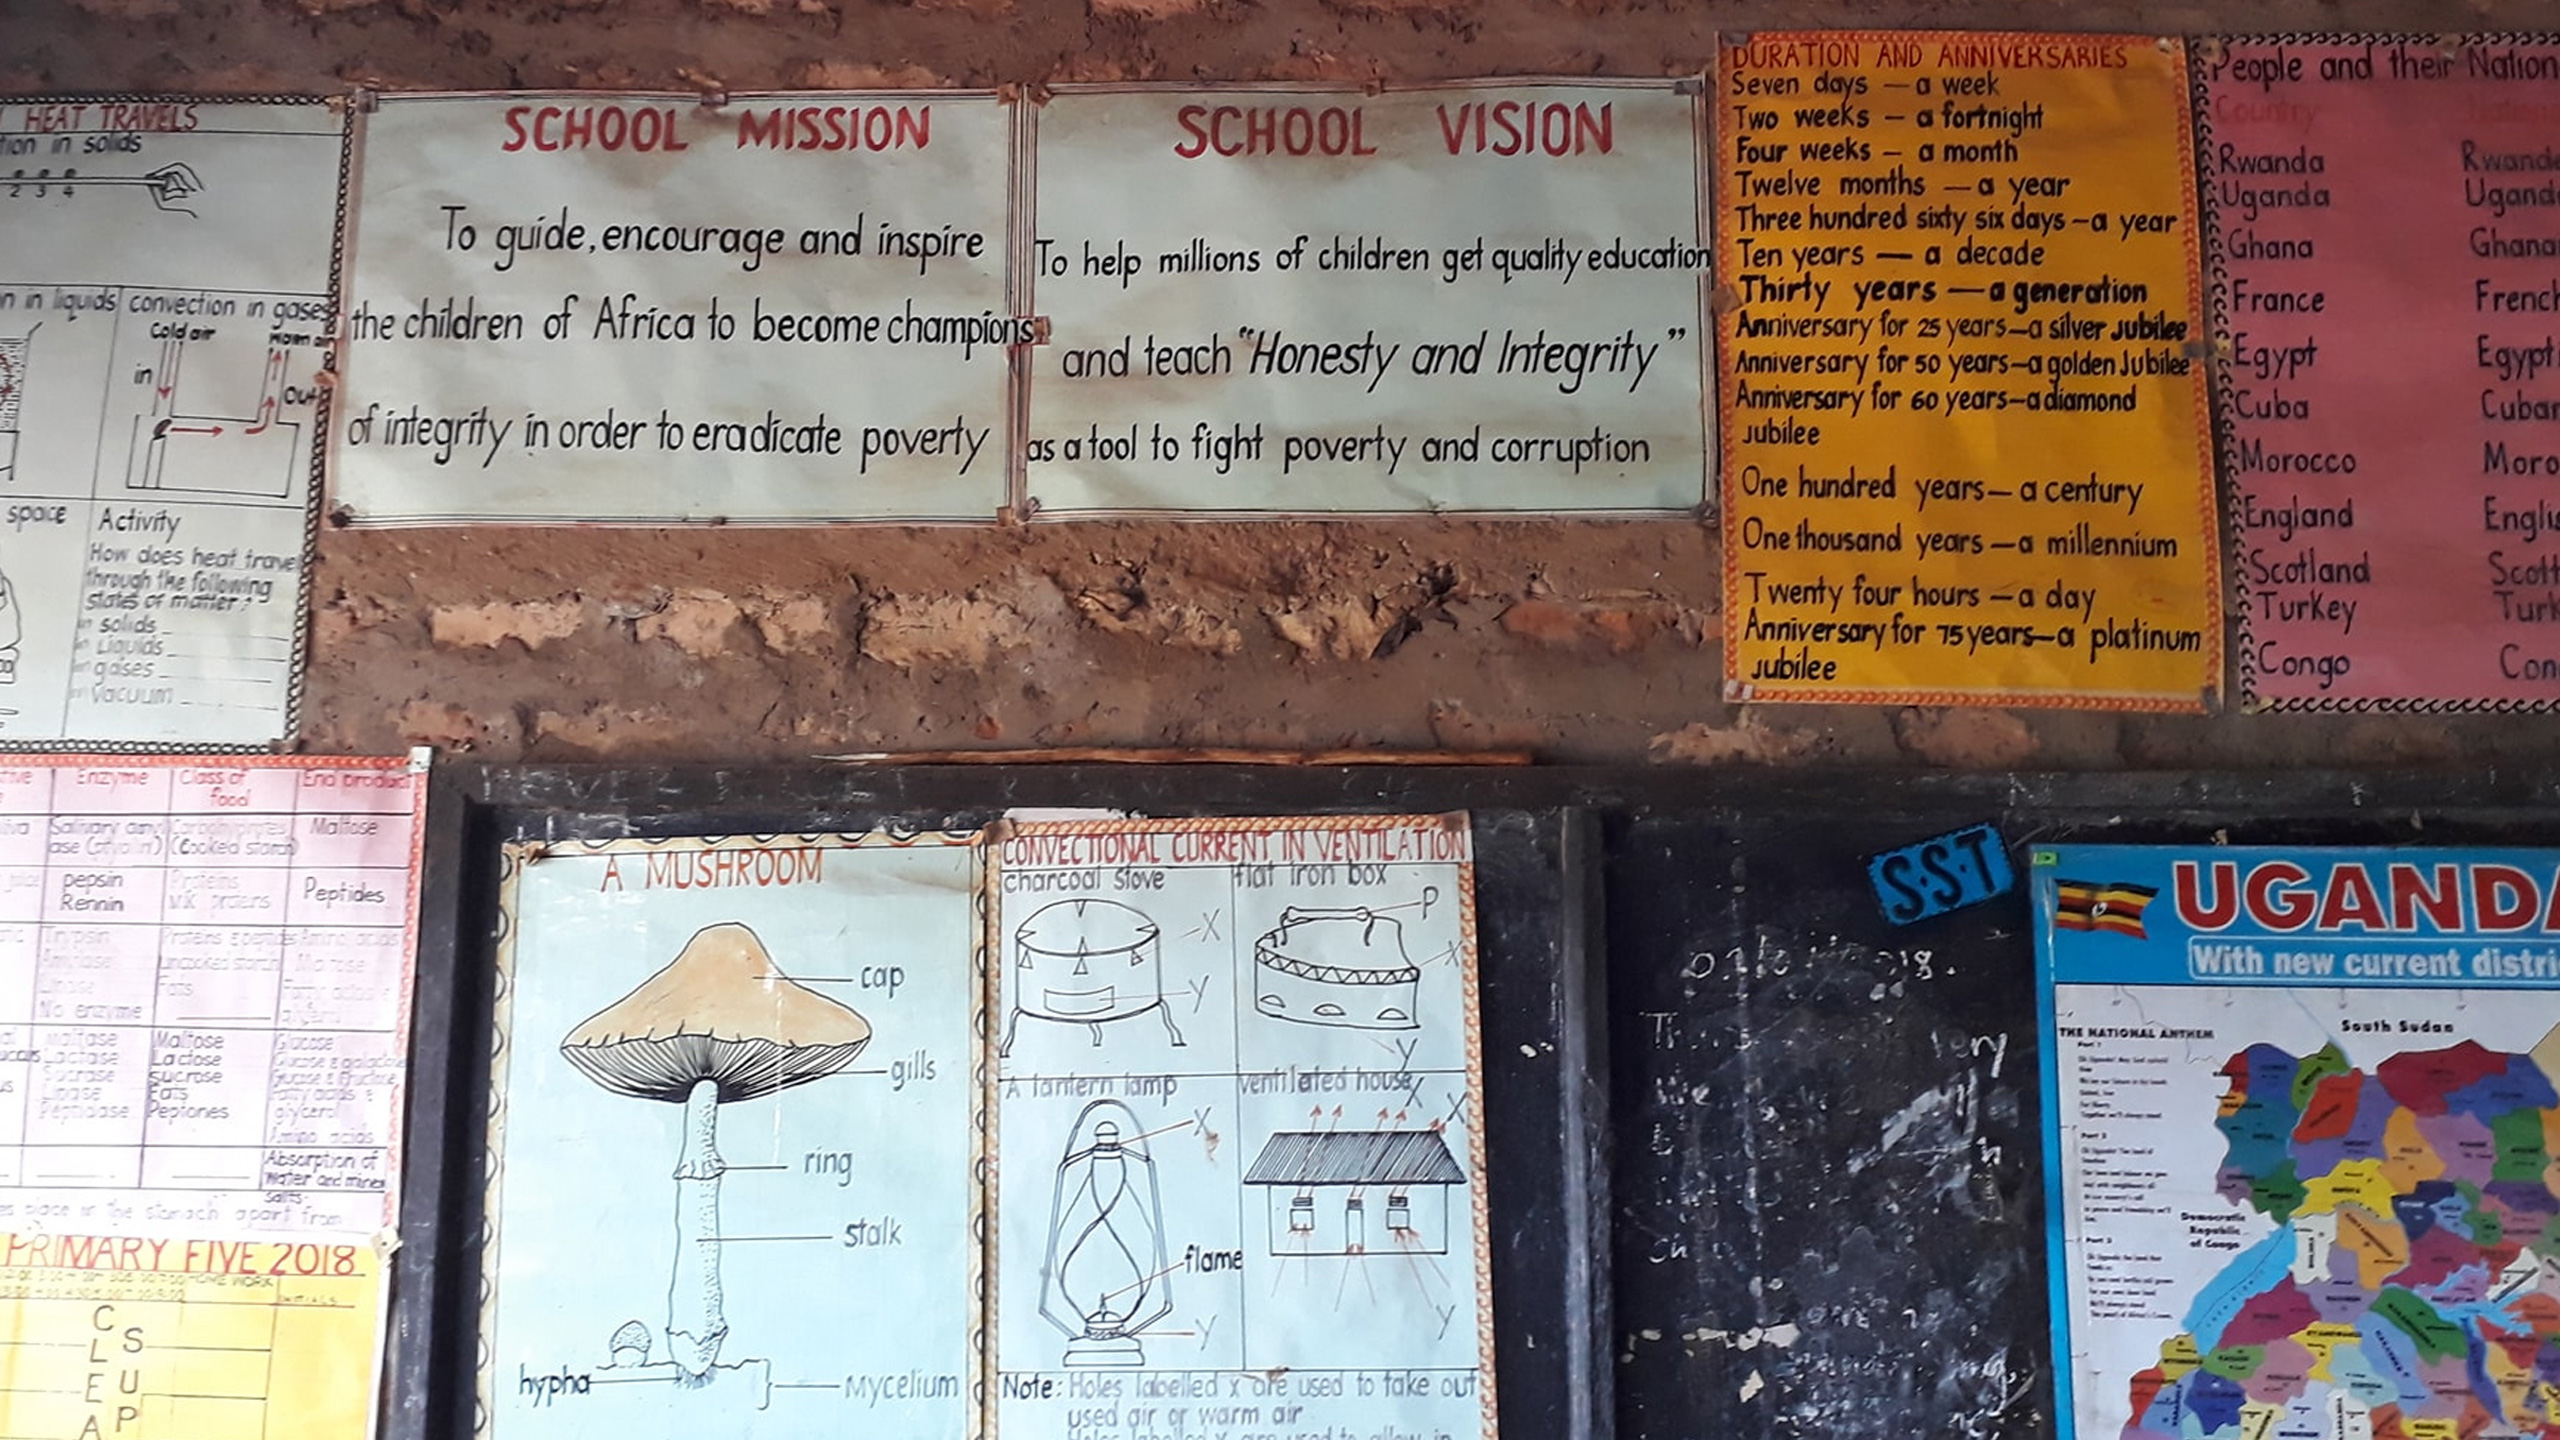 Besuch der Schule am Äquator